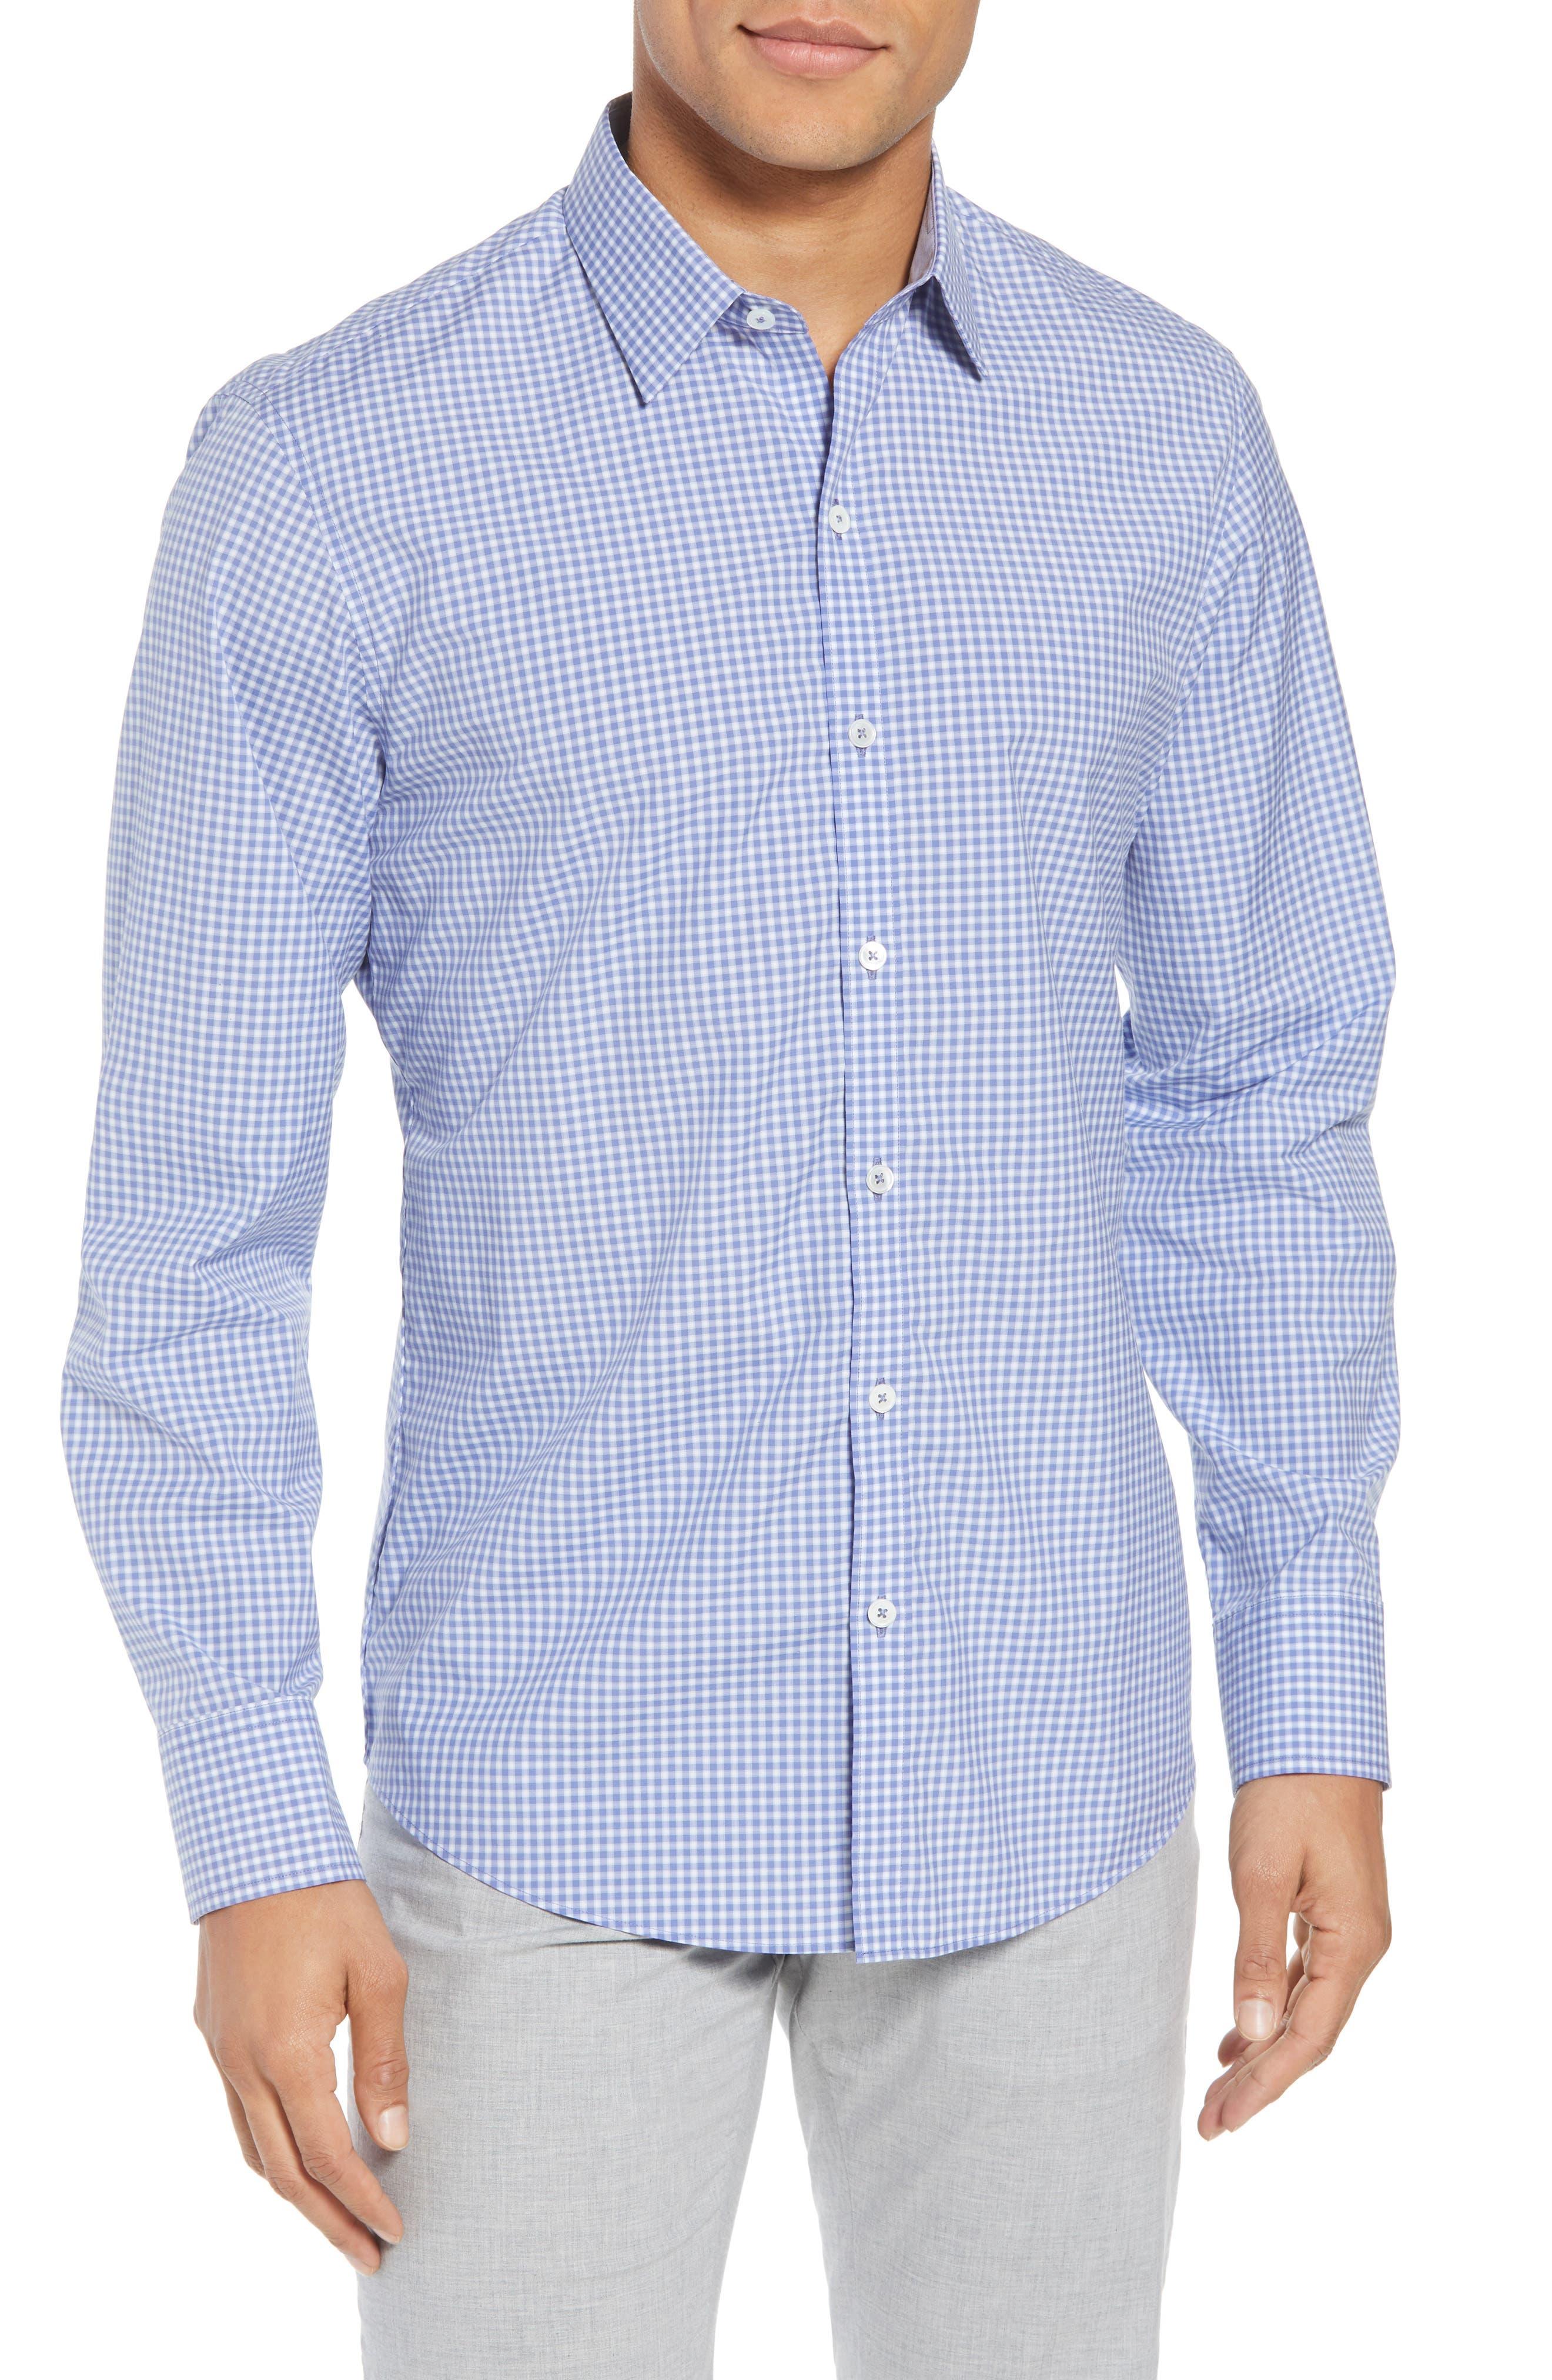 Winston Regular Fit Sport Shirt,                         Main,                         color, 422